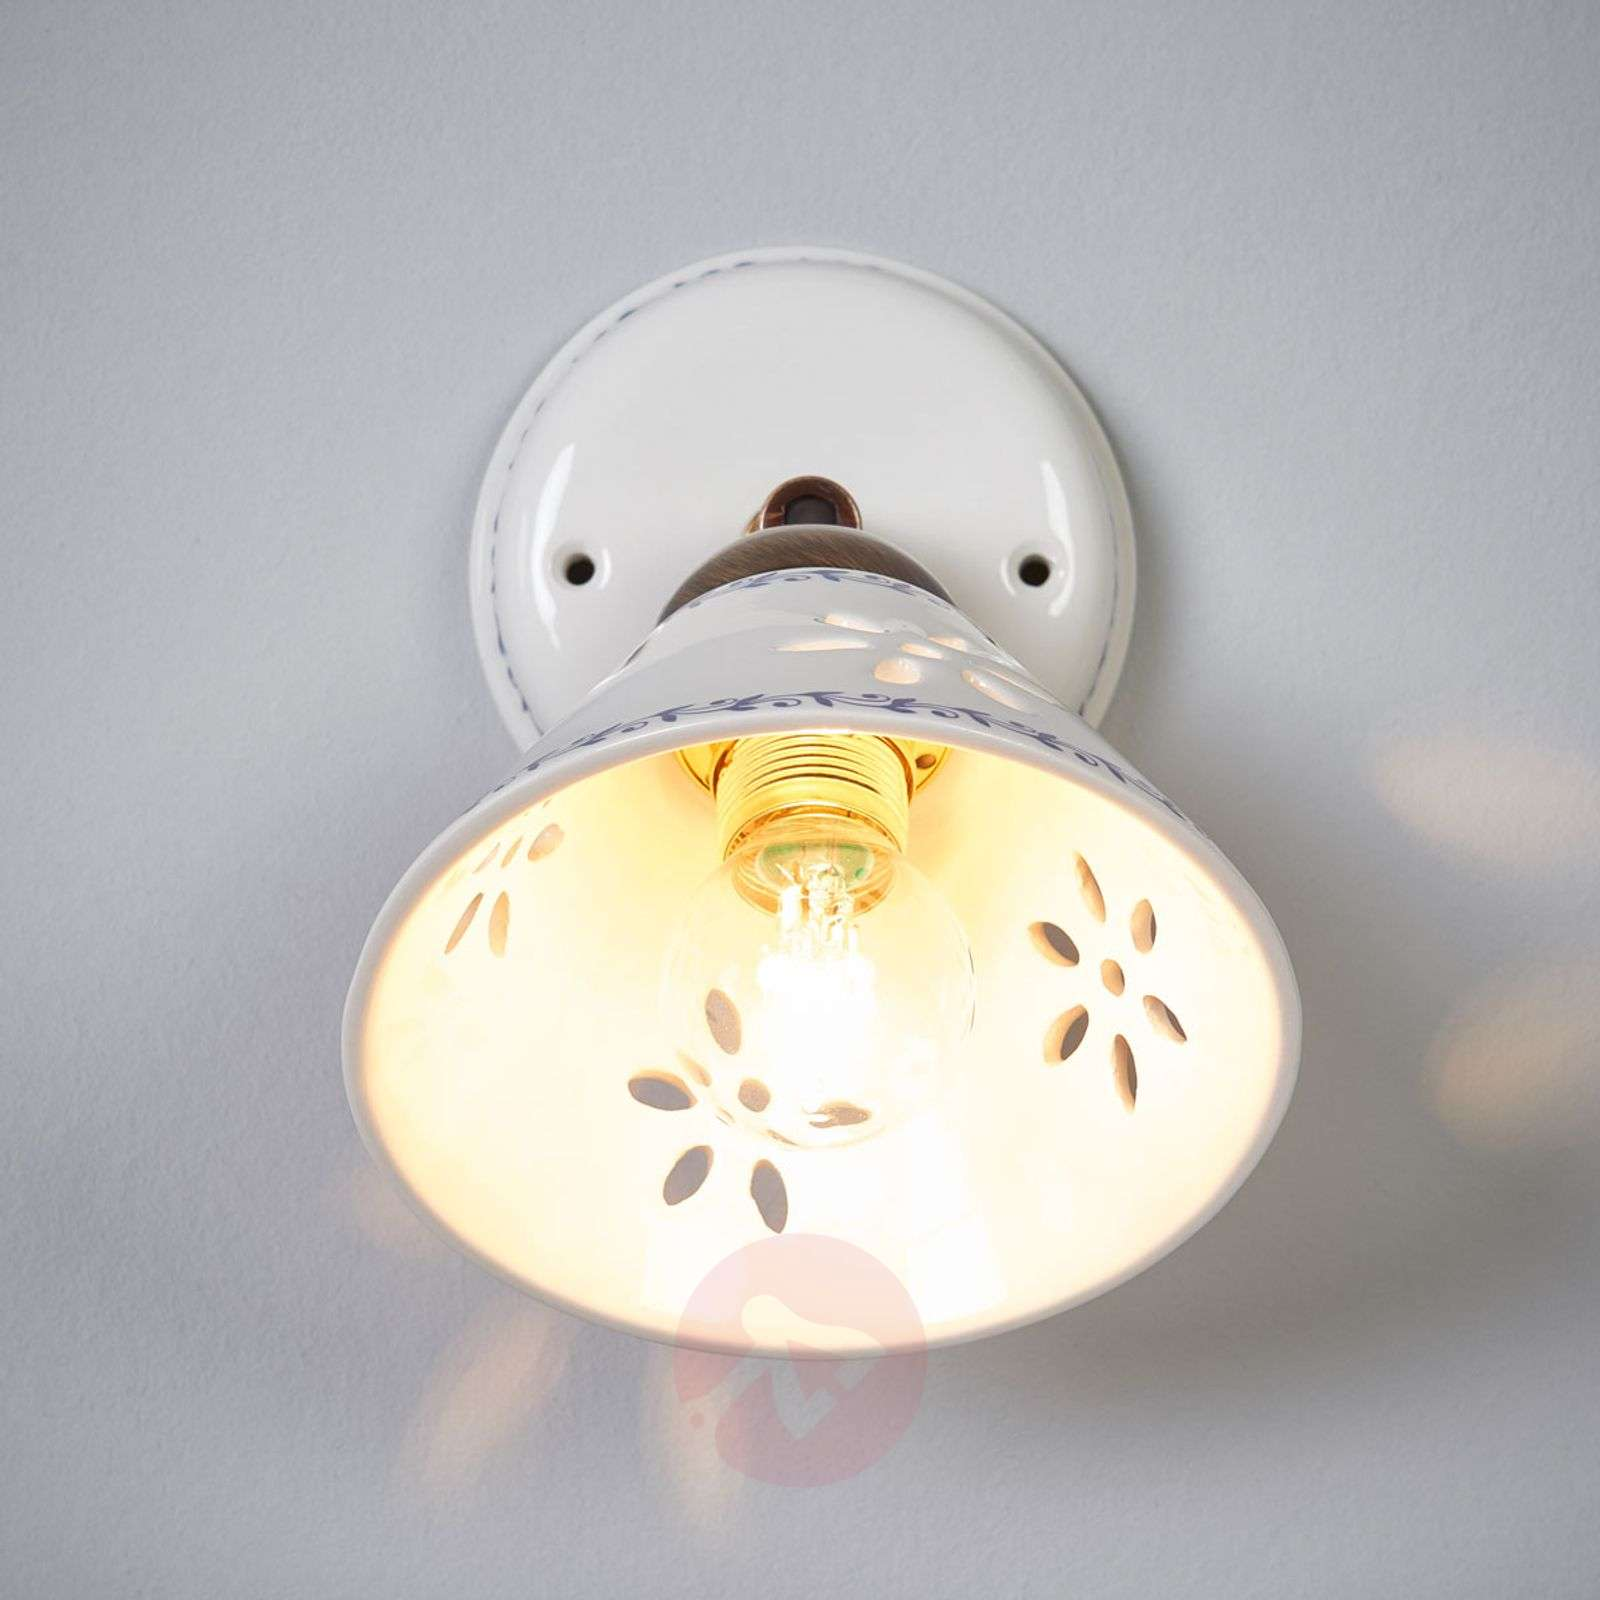 NONNA wall light, made of white ceramic-2013025-01